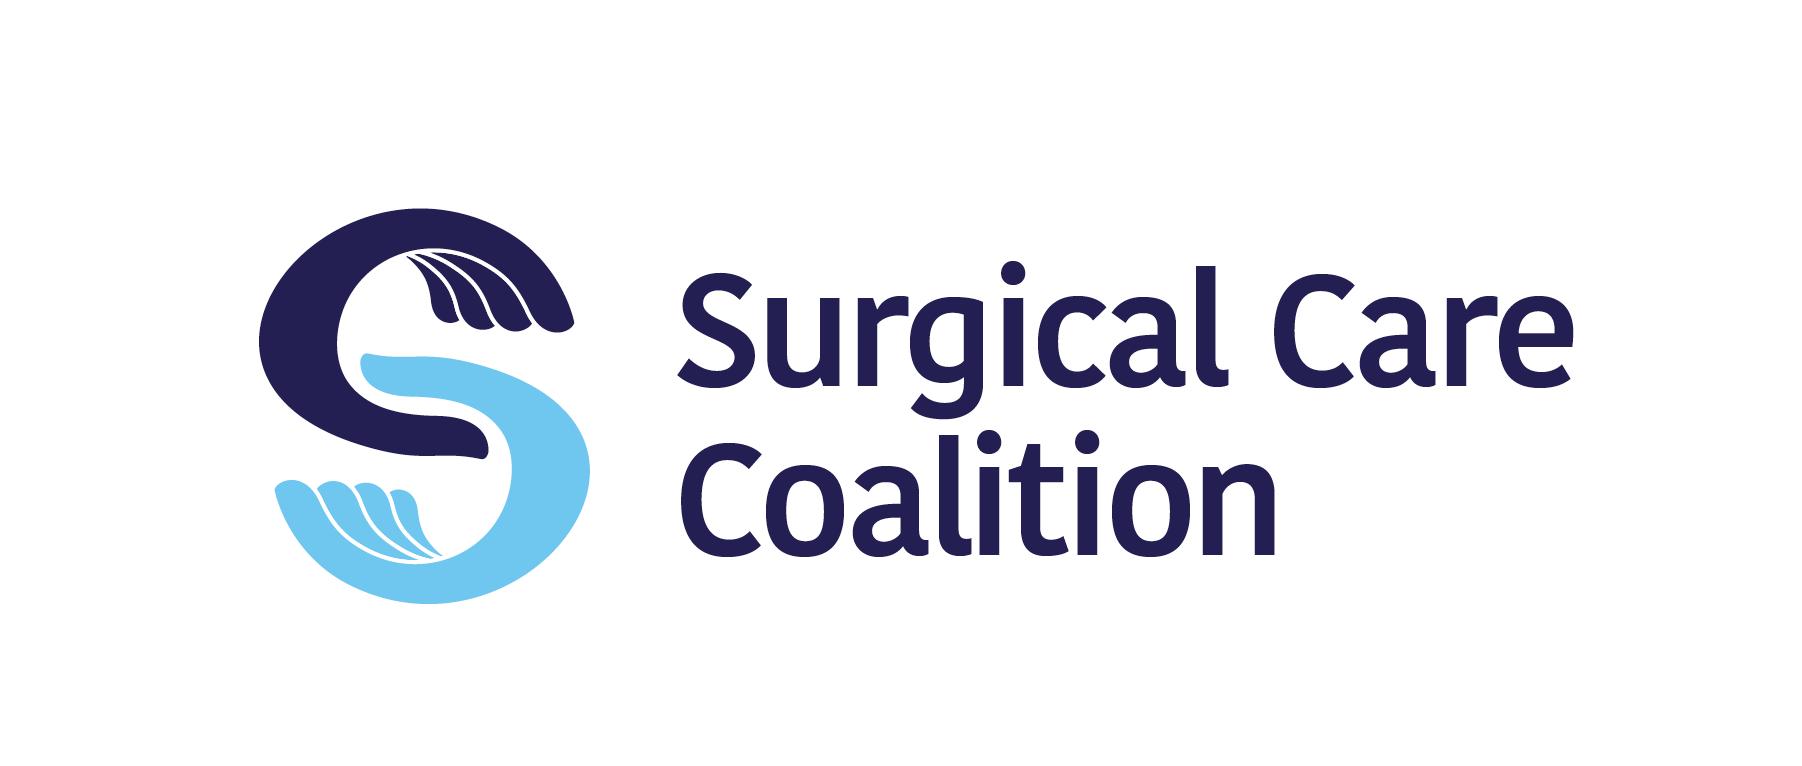 surgical care coalition logo